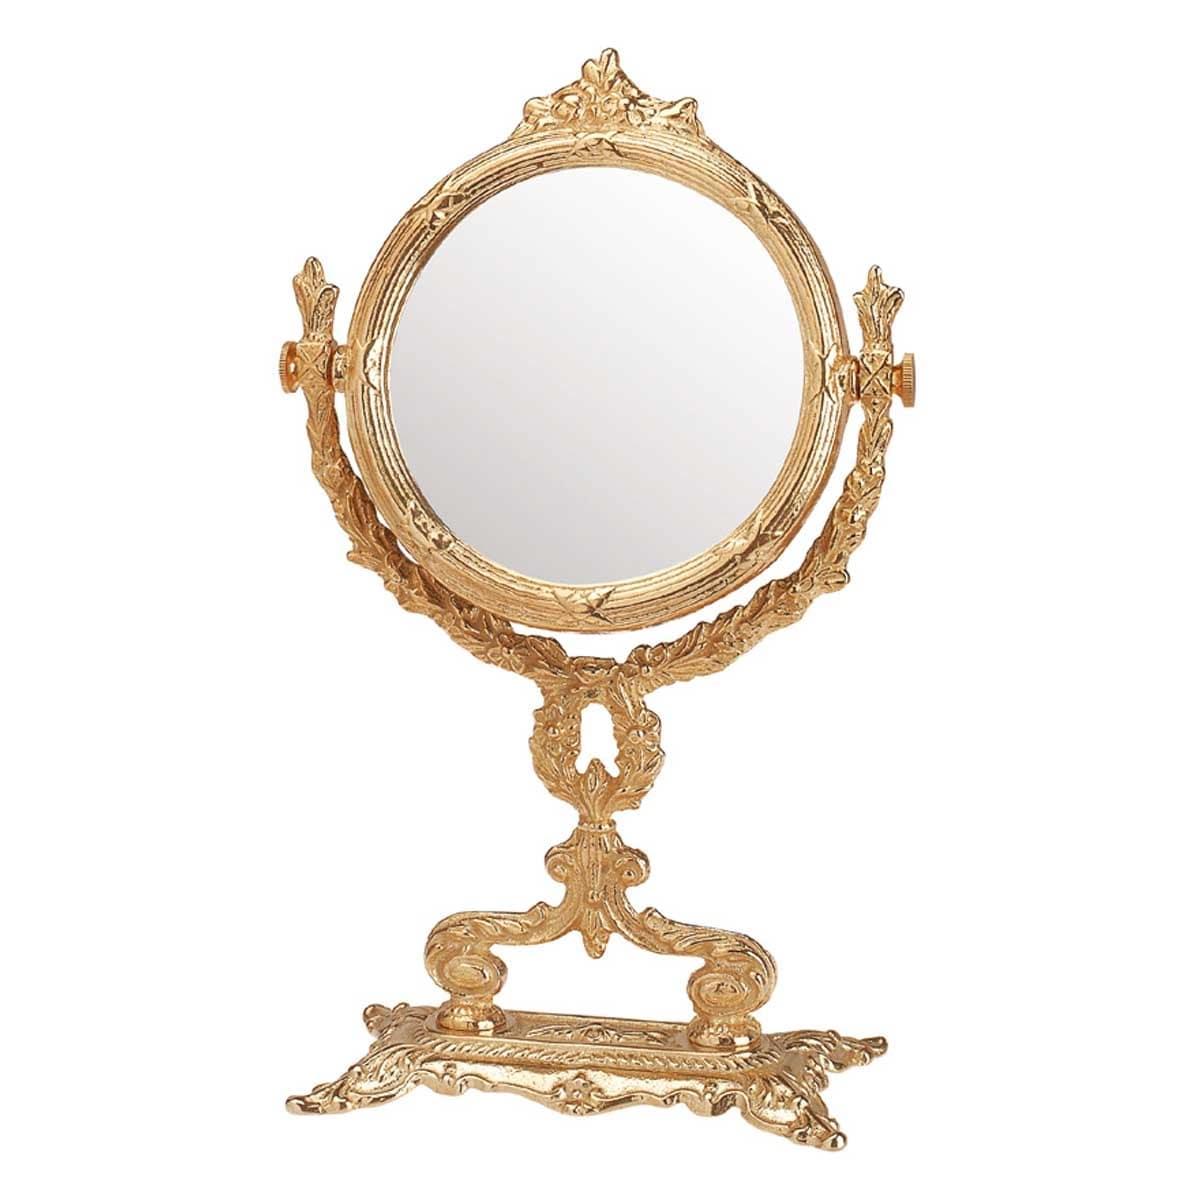 Victorian Antique Vanity Mirror Cast Brass 12 1 4 H Renovator S Supply Overstock 13743270